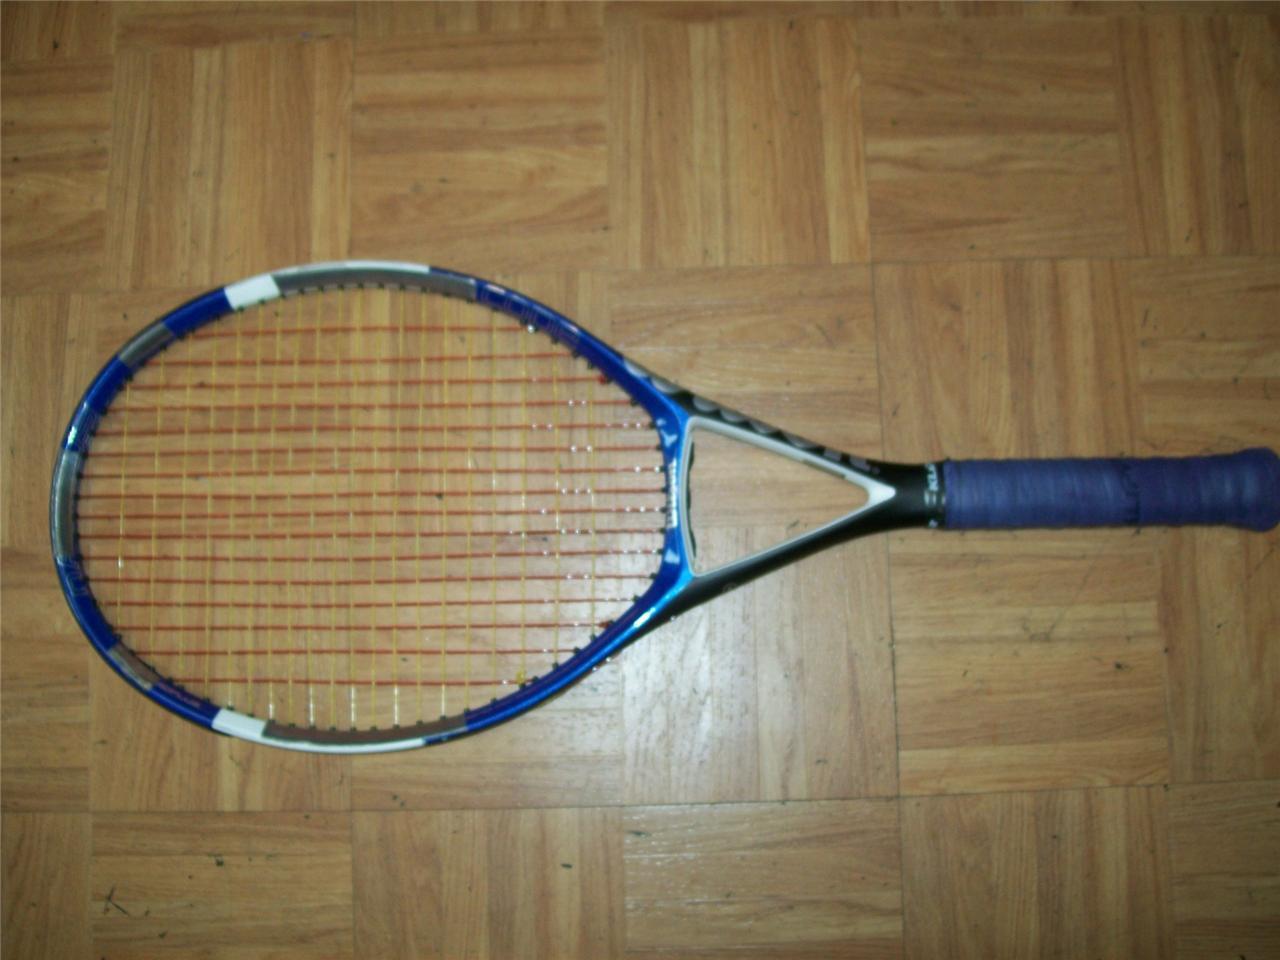 Wilson Ncode N Focus Midplus 103 4 1 2 grip Tennis Racquet